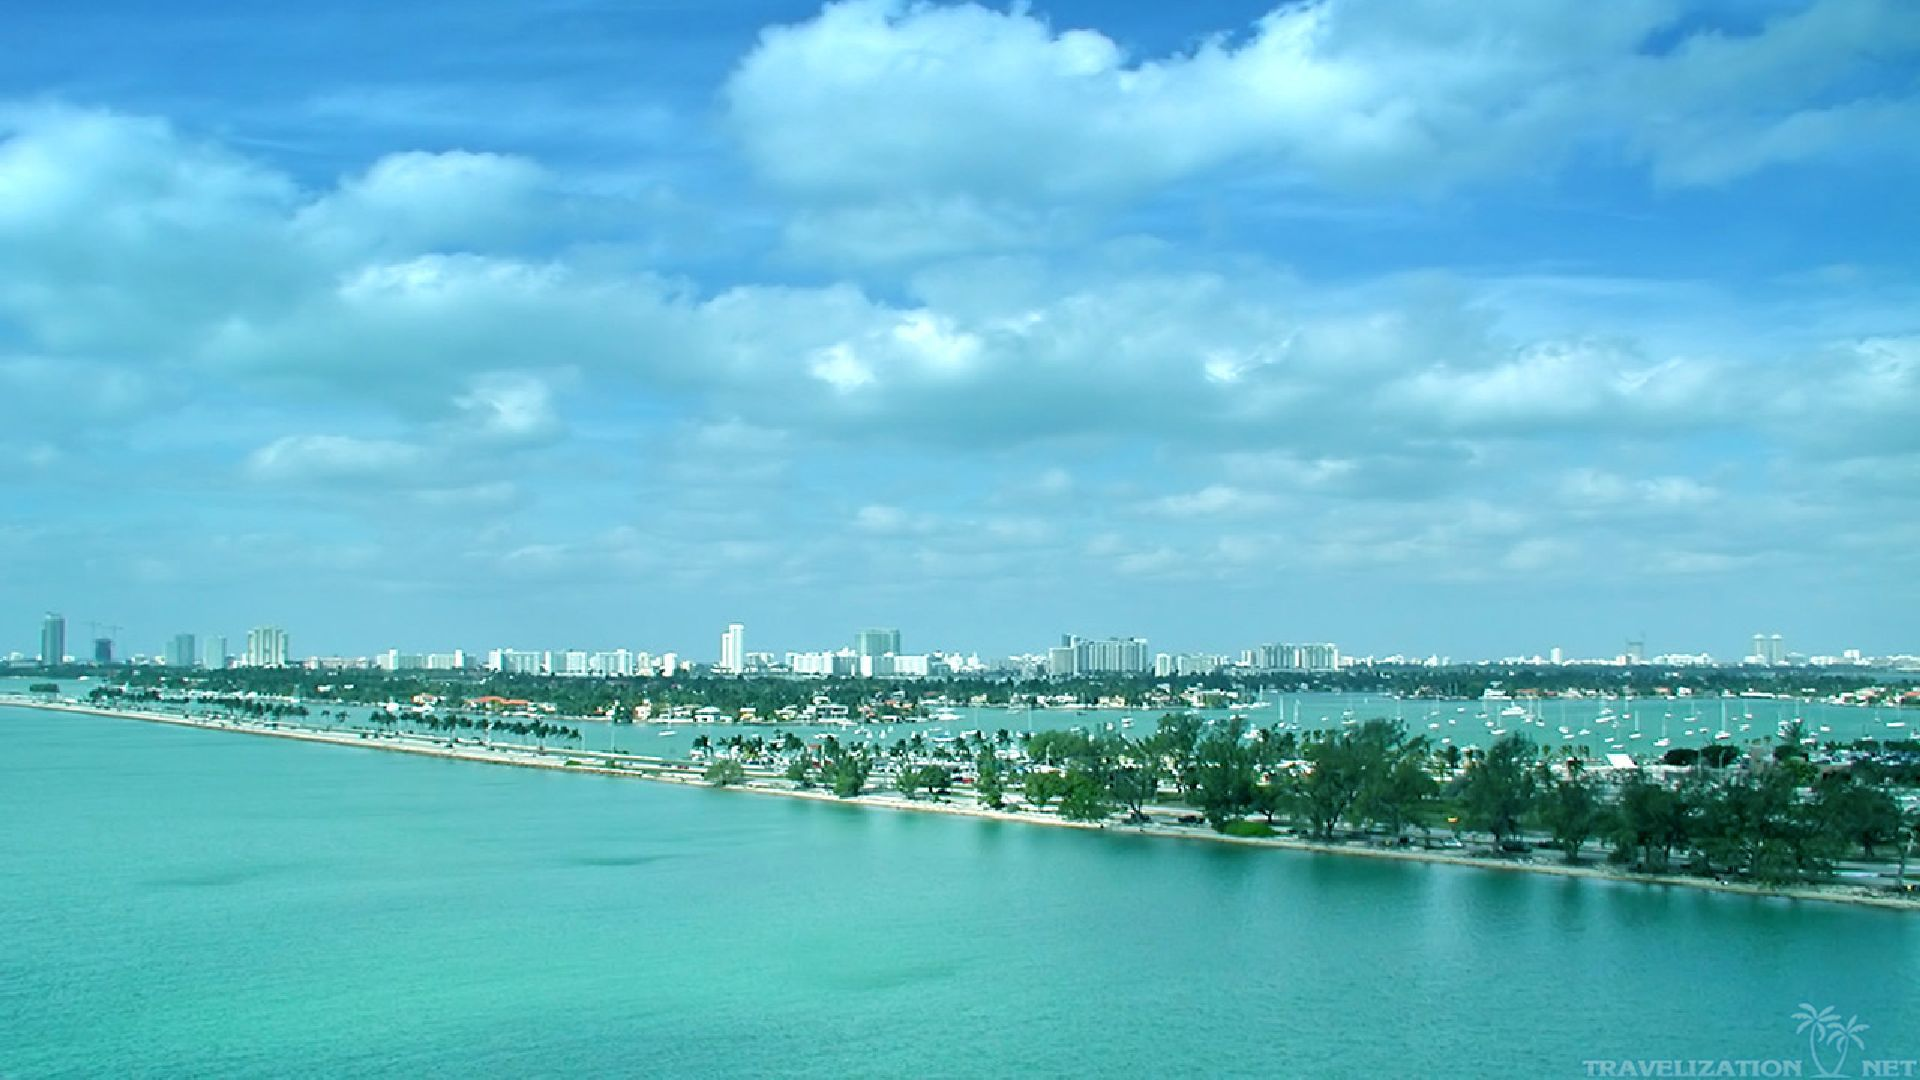 Miami Beach Florida Pictures HD Wallpaper Miami Beach Florida Pictures 1920x1080